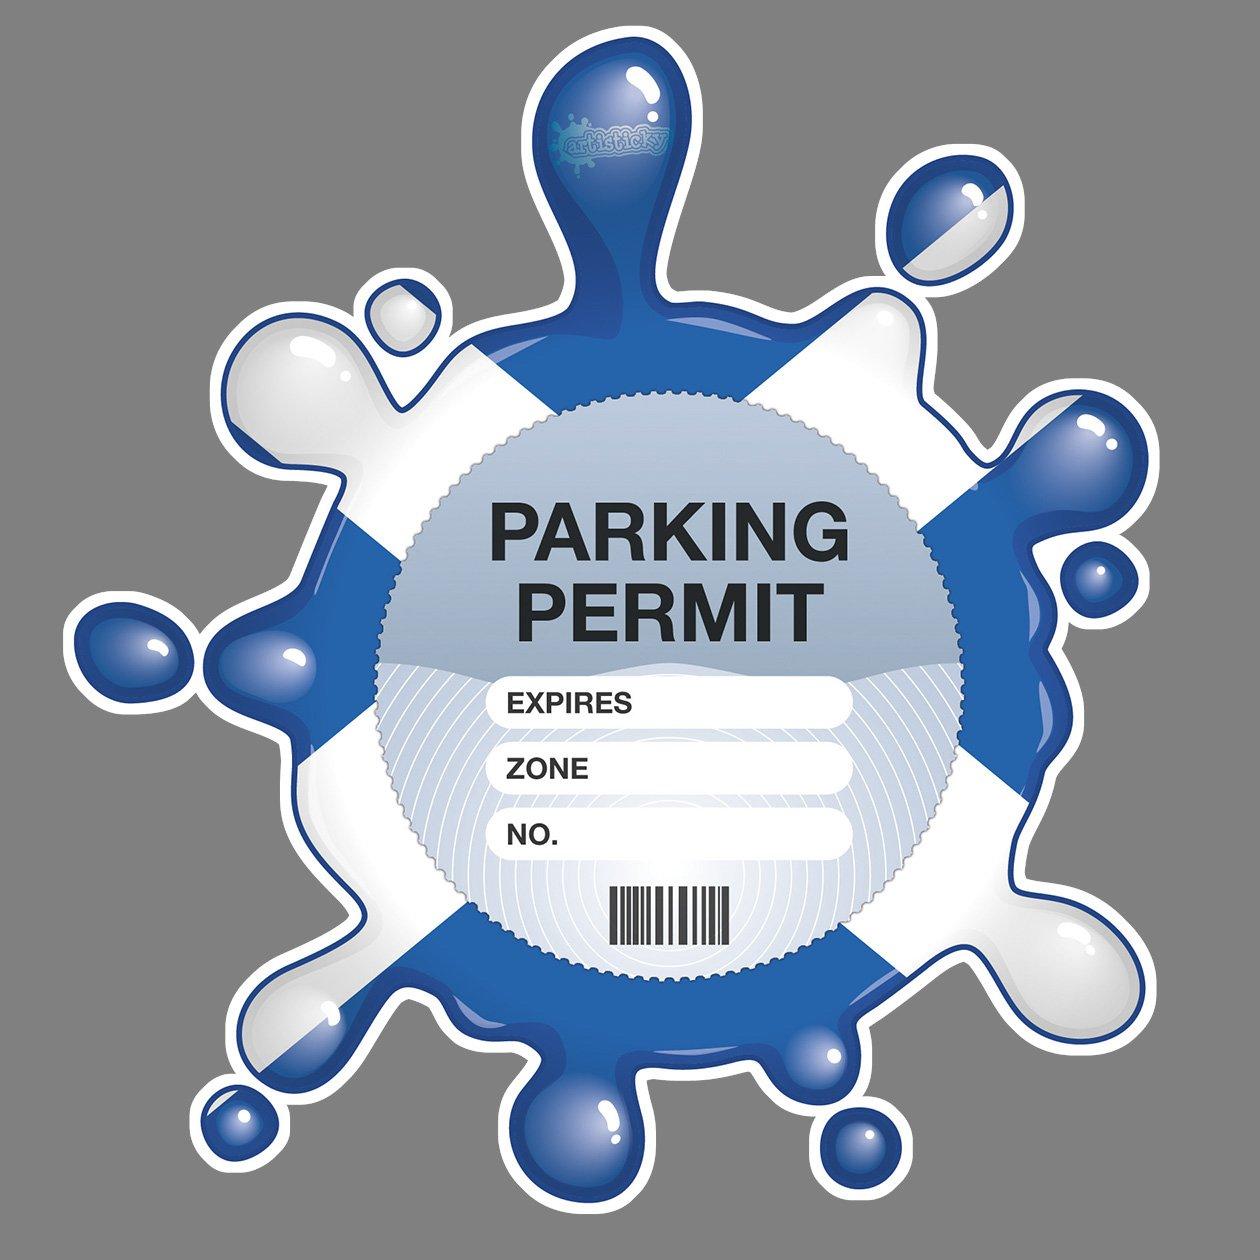 Parking Permit Holder Skin - Scottish Flag Splat Free UK Postage Artisticky AS-0037